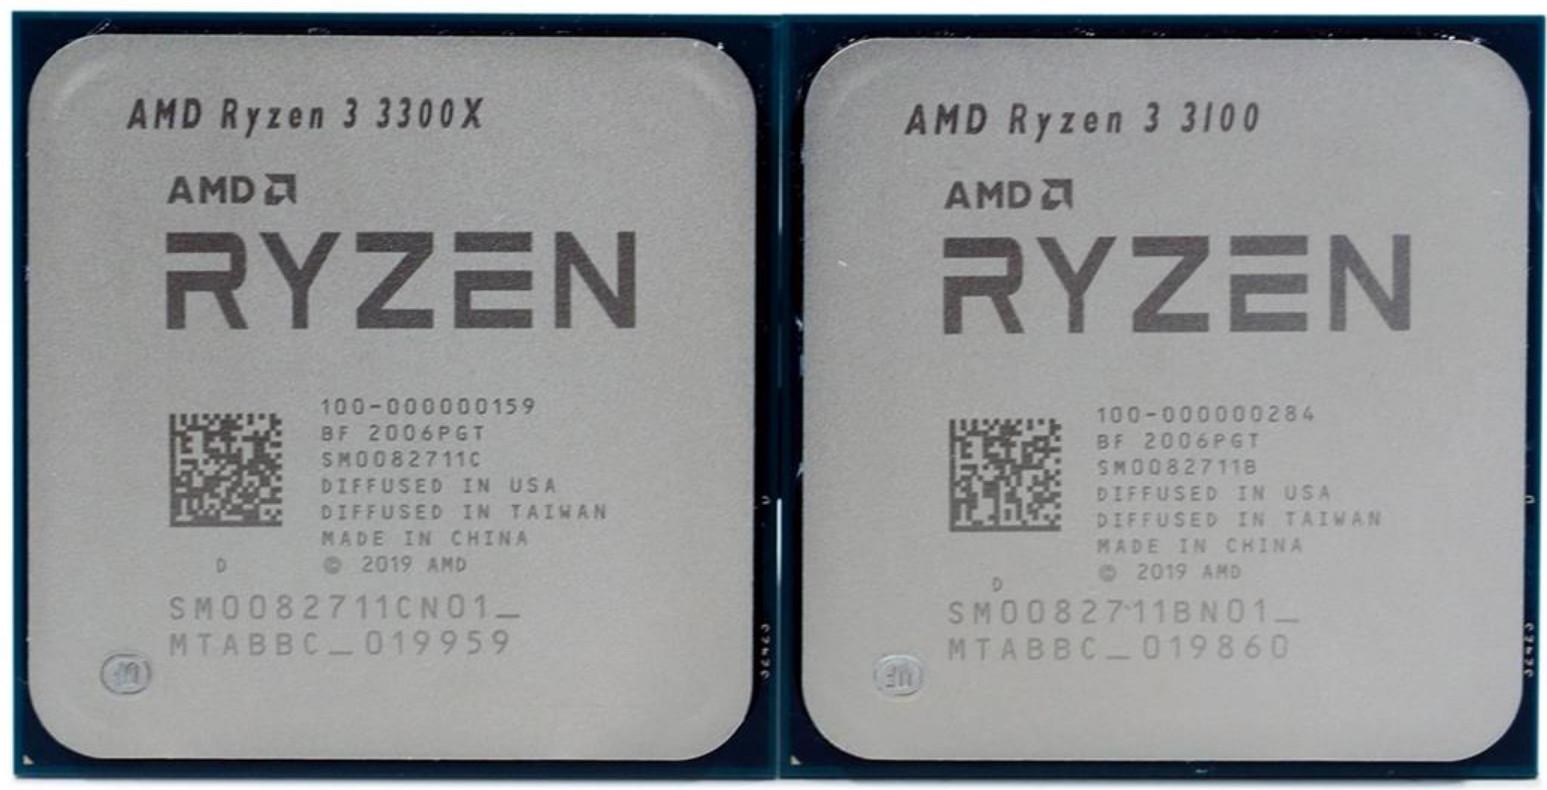 AMD Ryzen 3300X 3100